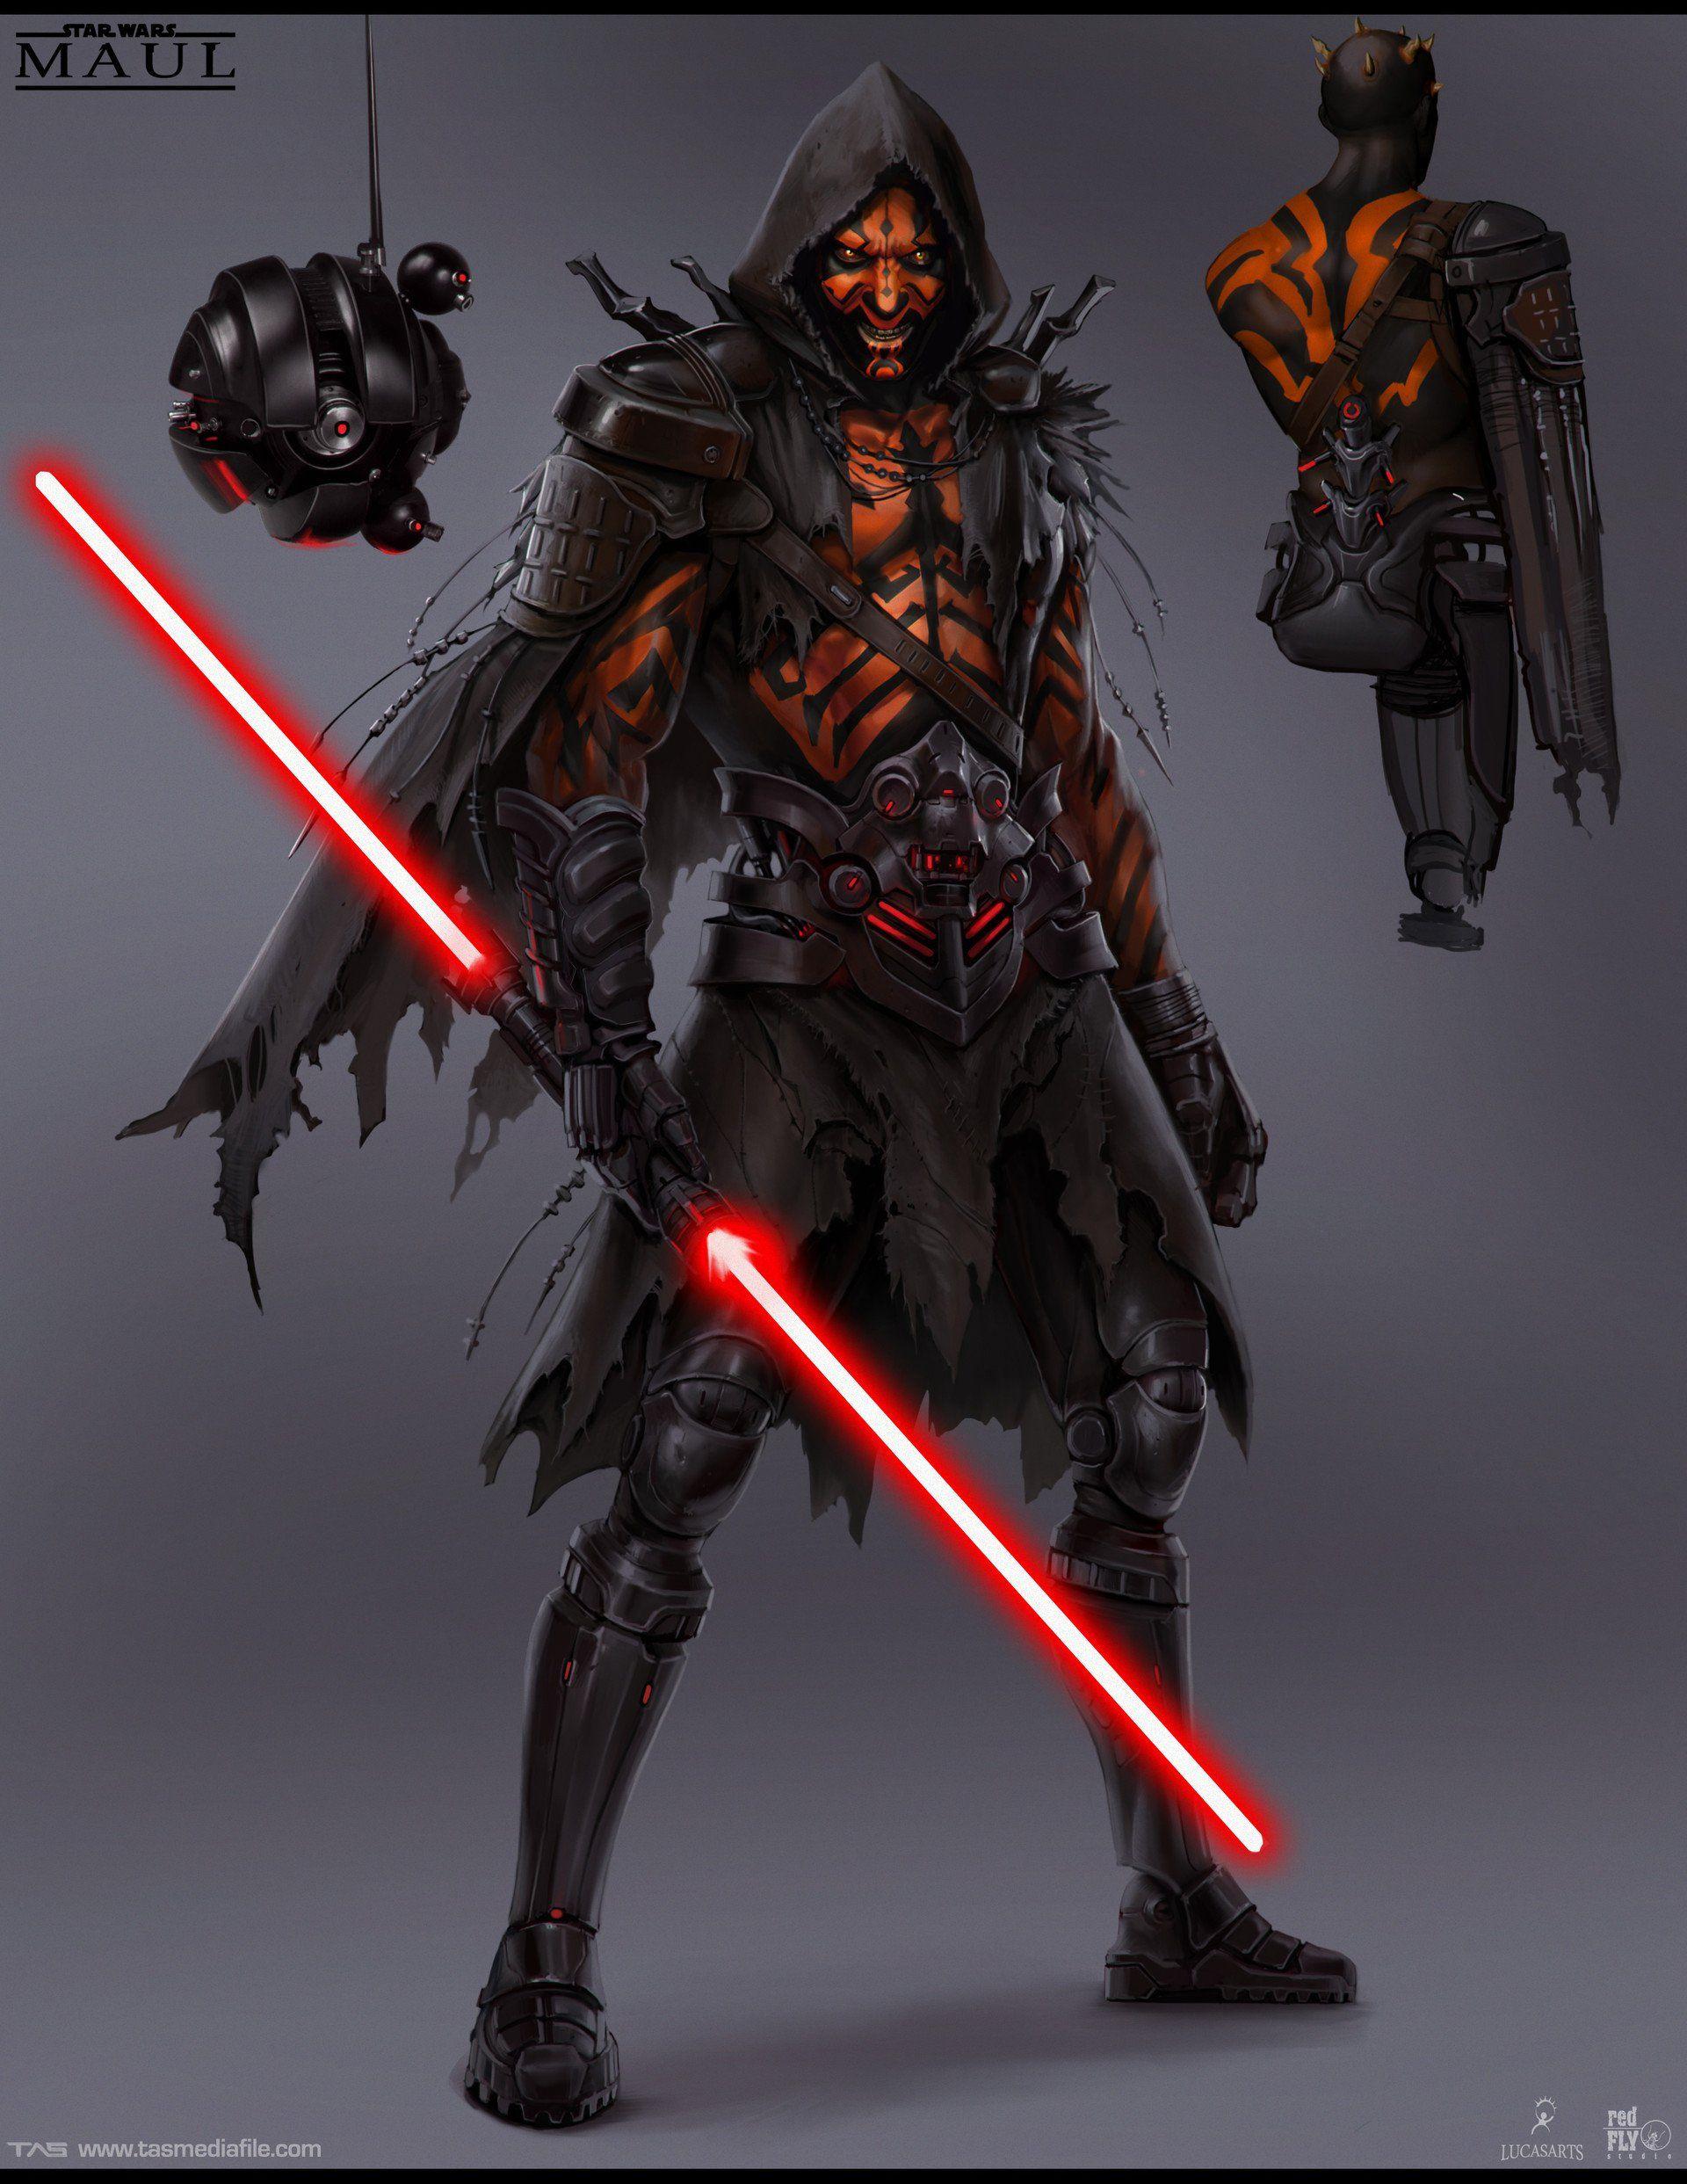 canceled darth maul game art reveals new star wars characters dark